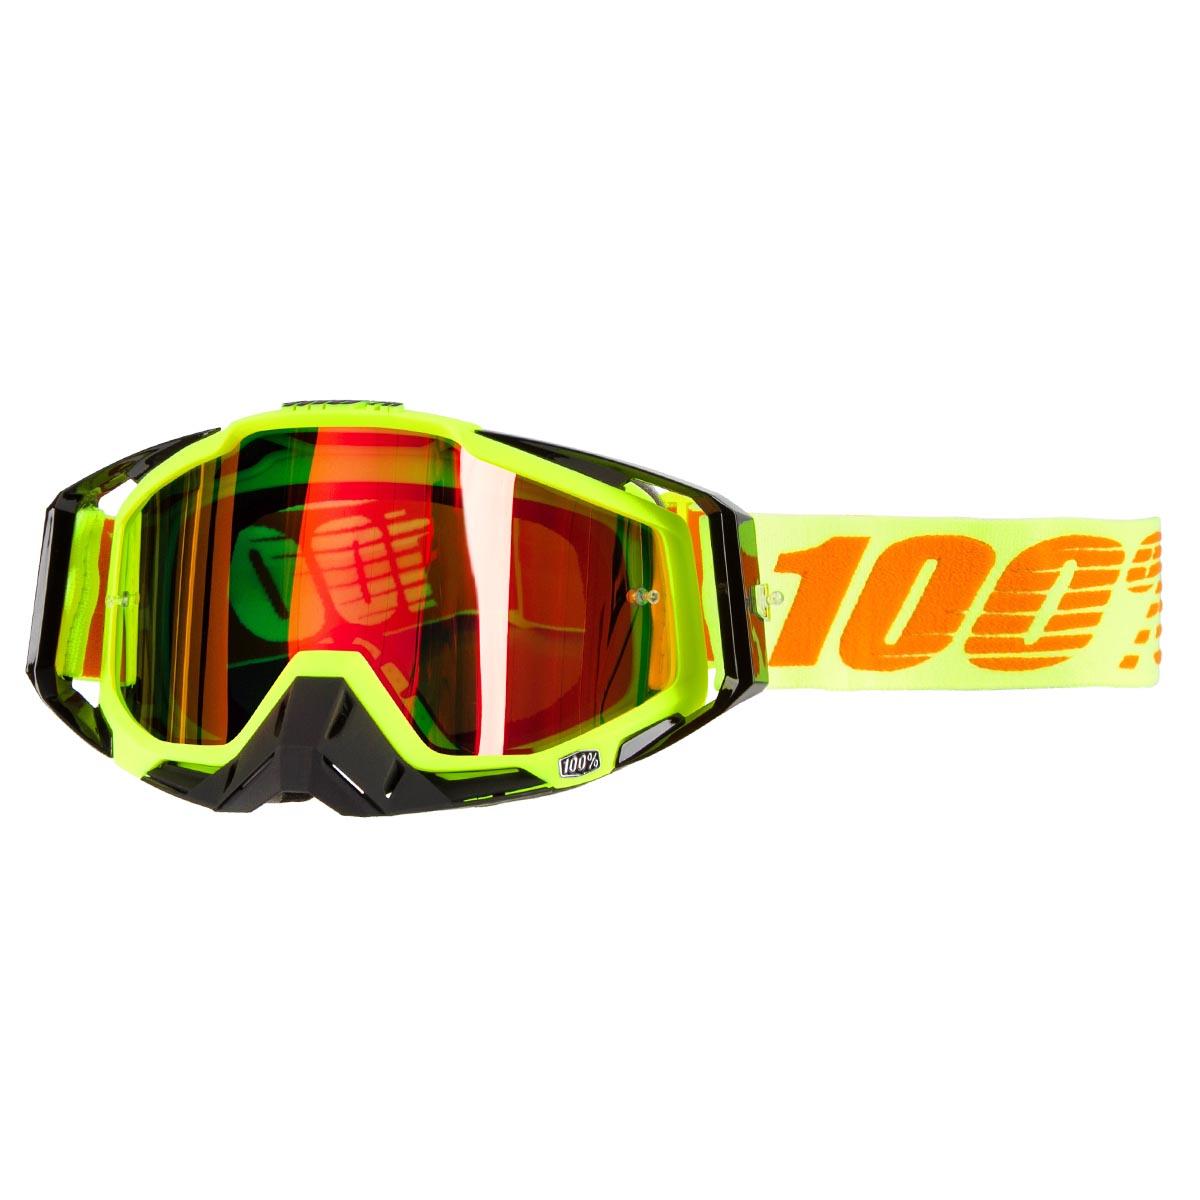 100% Crossbrille The Racecraft Attack Yellow - Rot verspiegelt Anti-Fog